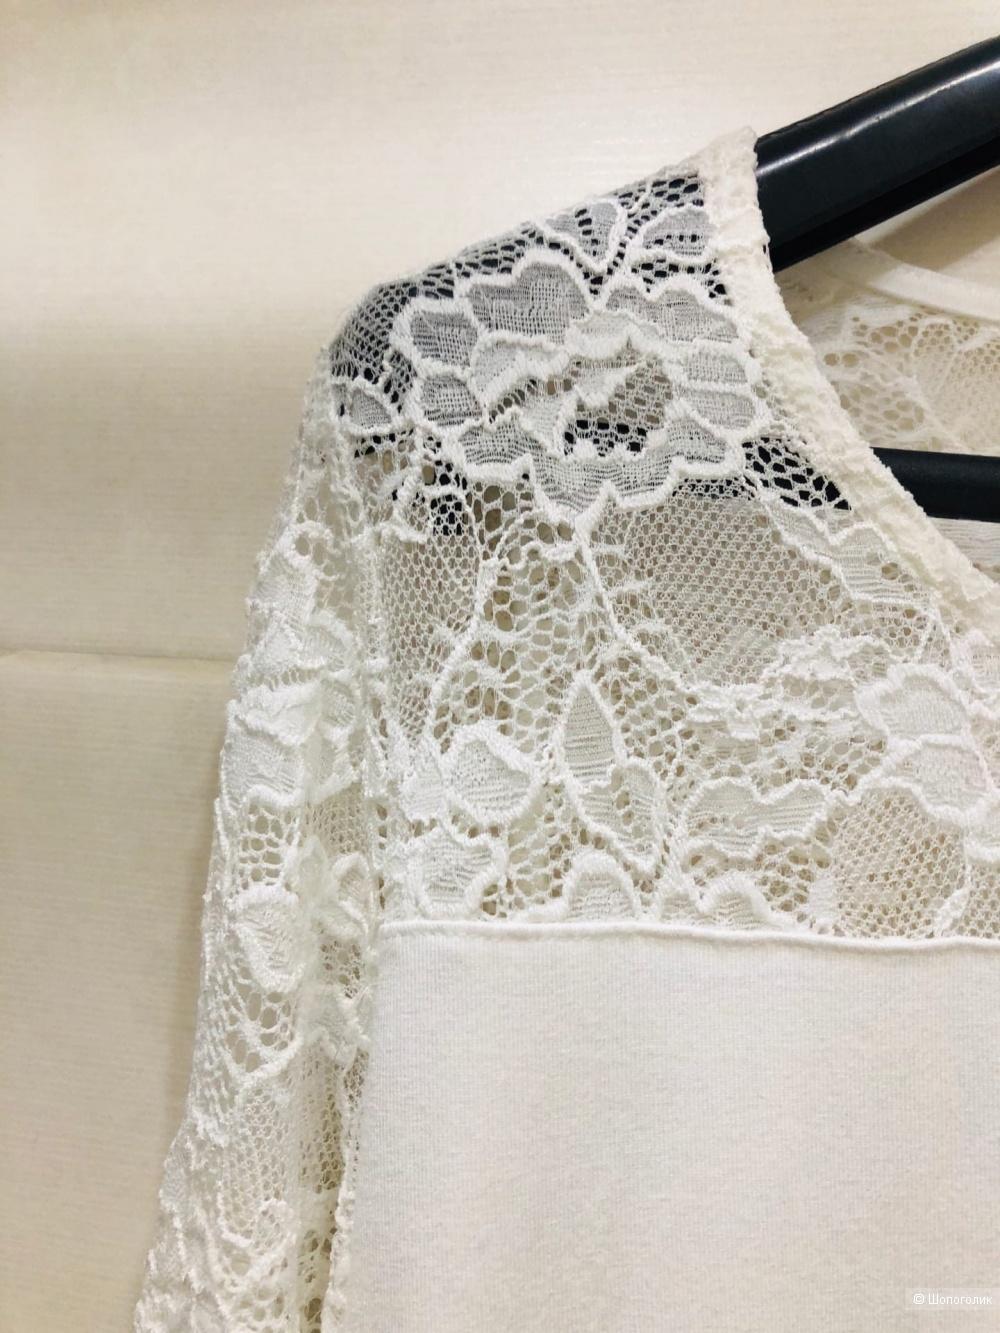 Блузка KAFFE  Lacy Rundhals. Размер S.